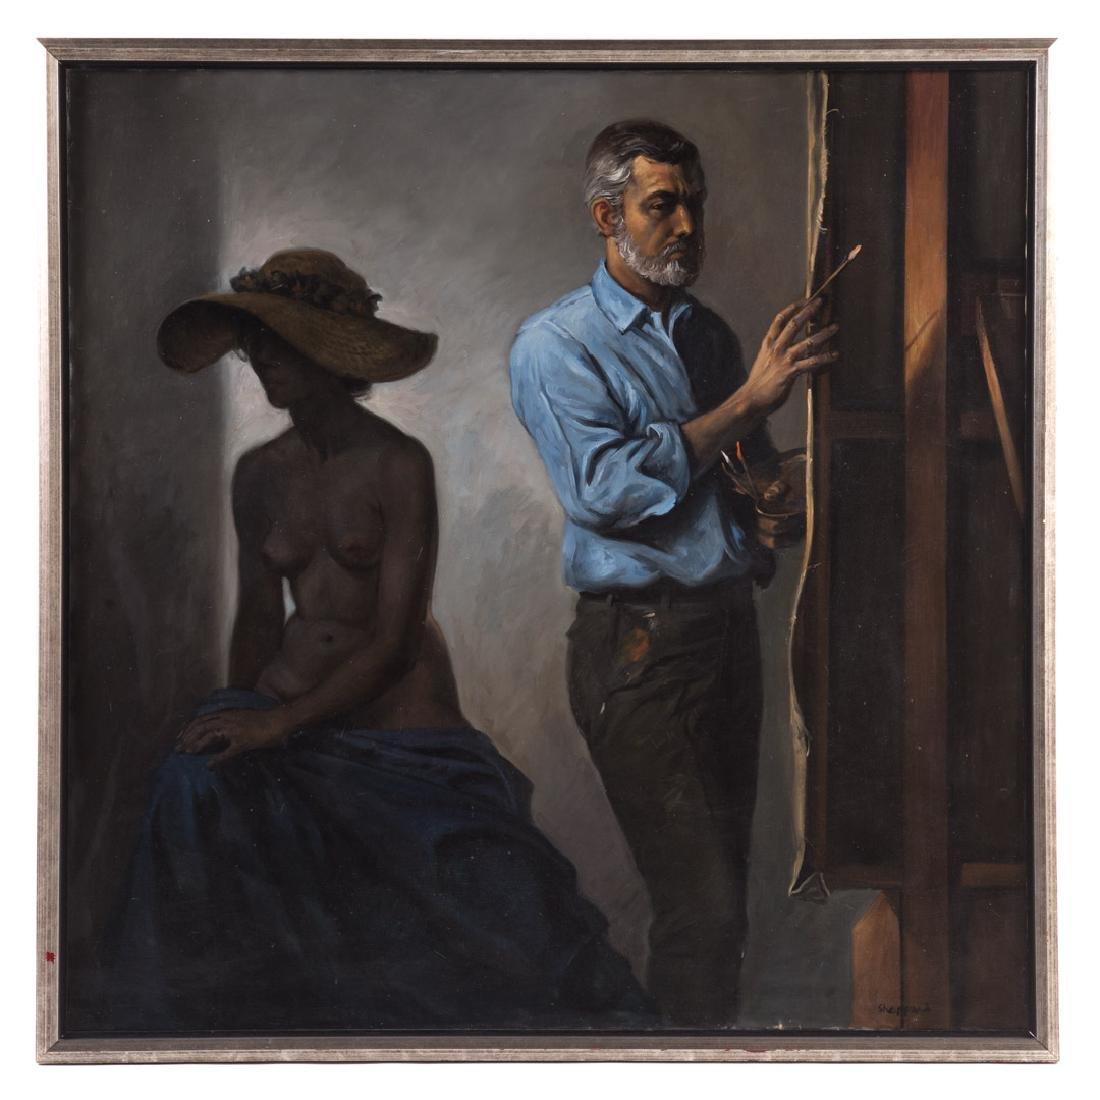 Joseph Sheppard. Self Portrait with Nude, oil